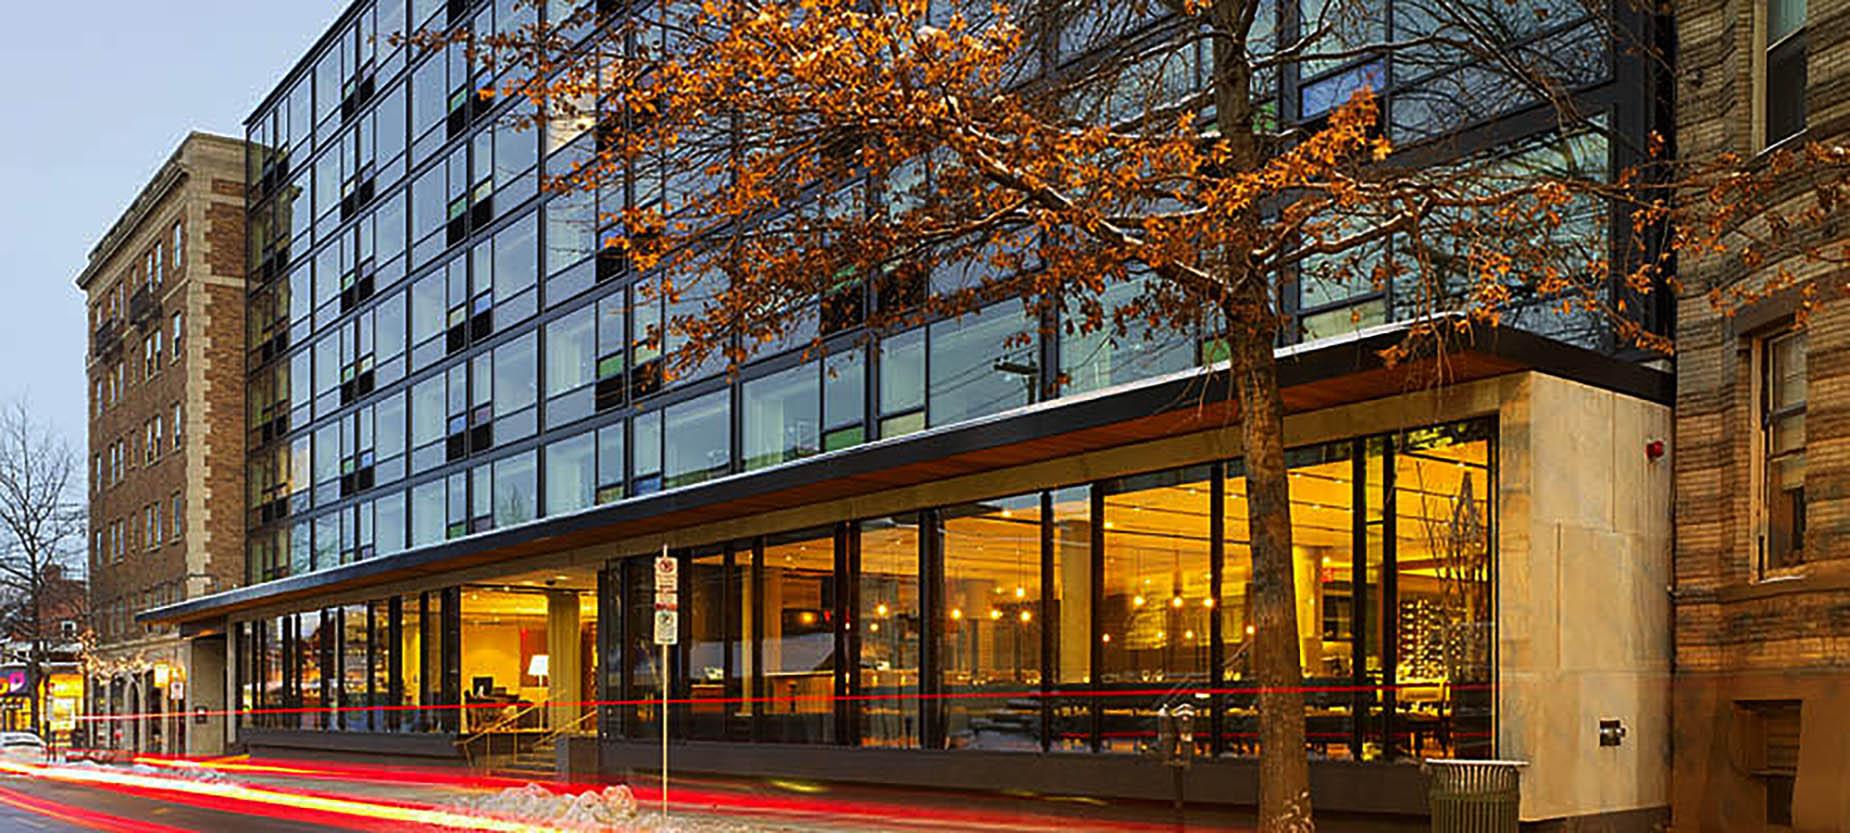 Study Hotel 1157 Chapel Street New Haven CT 06511